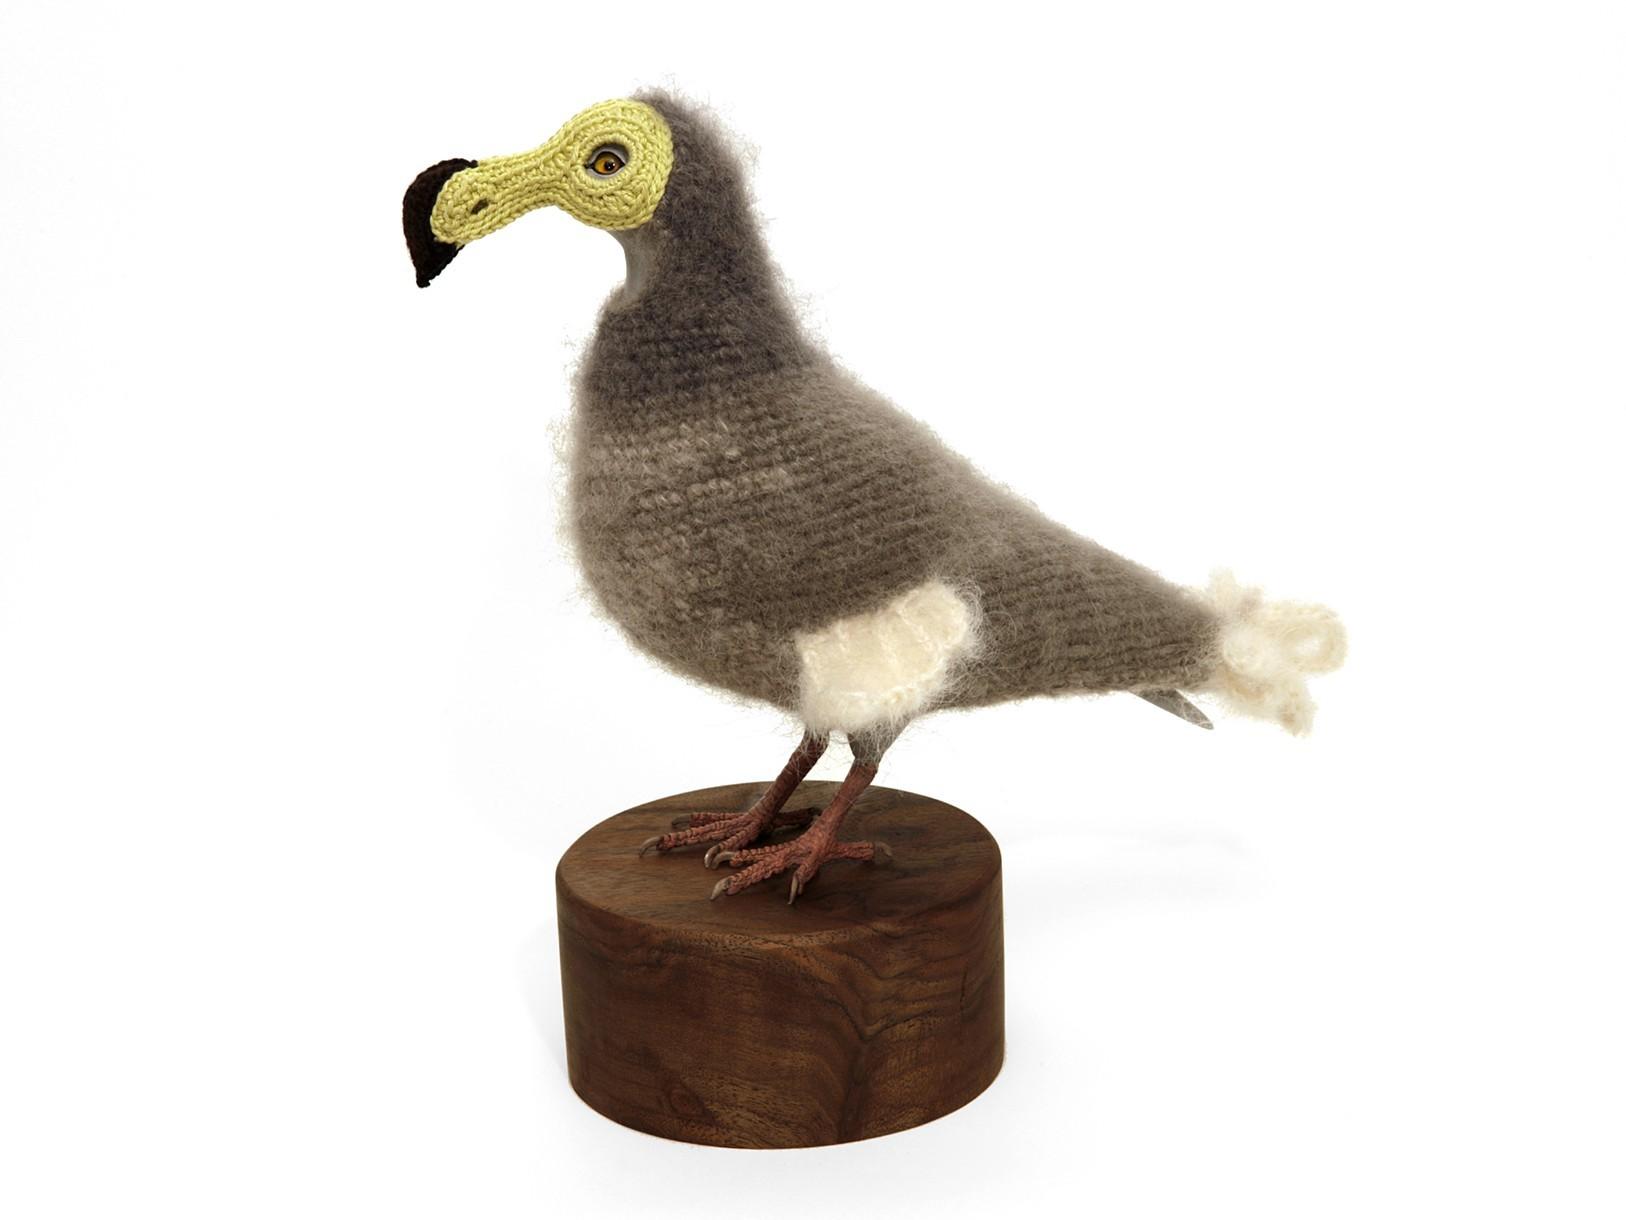 Urban Pigeons: Dodo II, 2014. Crocheted yarn, handmade pigeon mannequin, walnut stand.